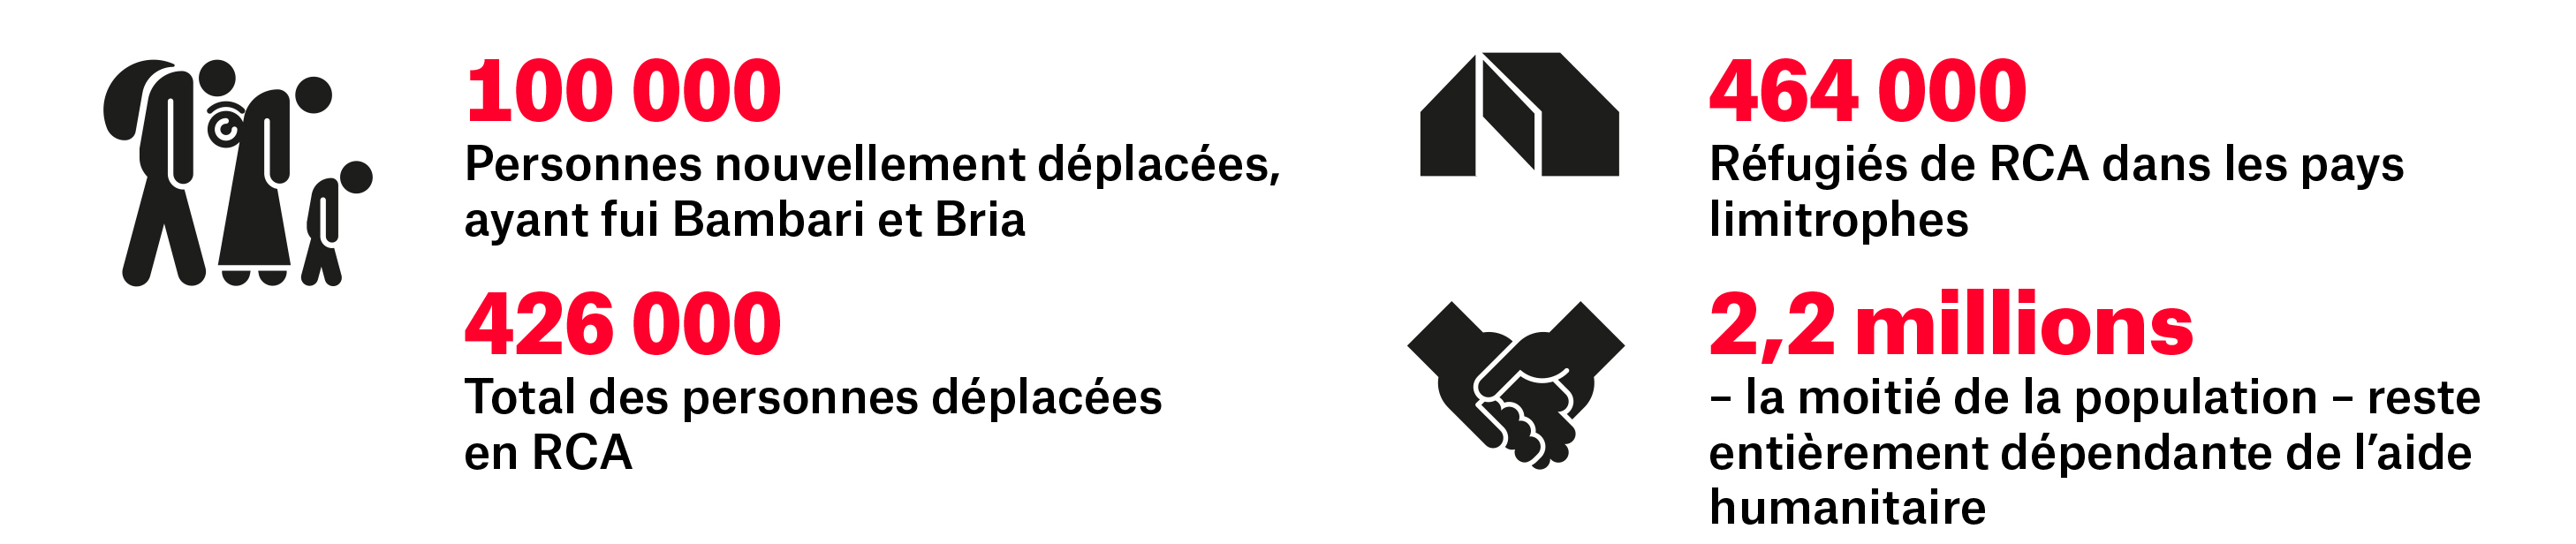 La situation humanitaire centrafricaine en chiffres